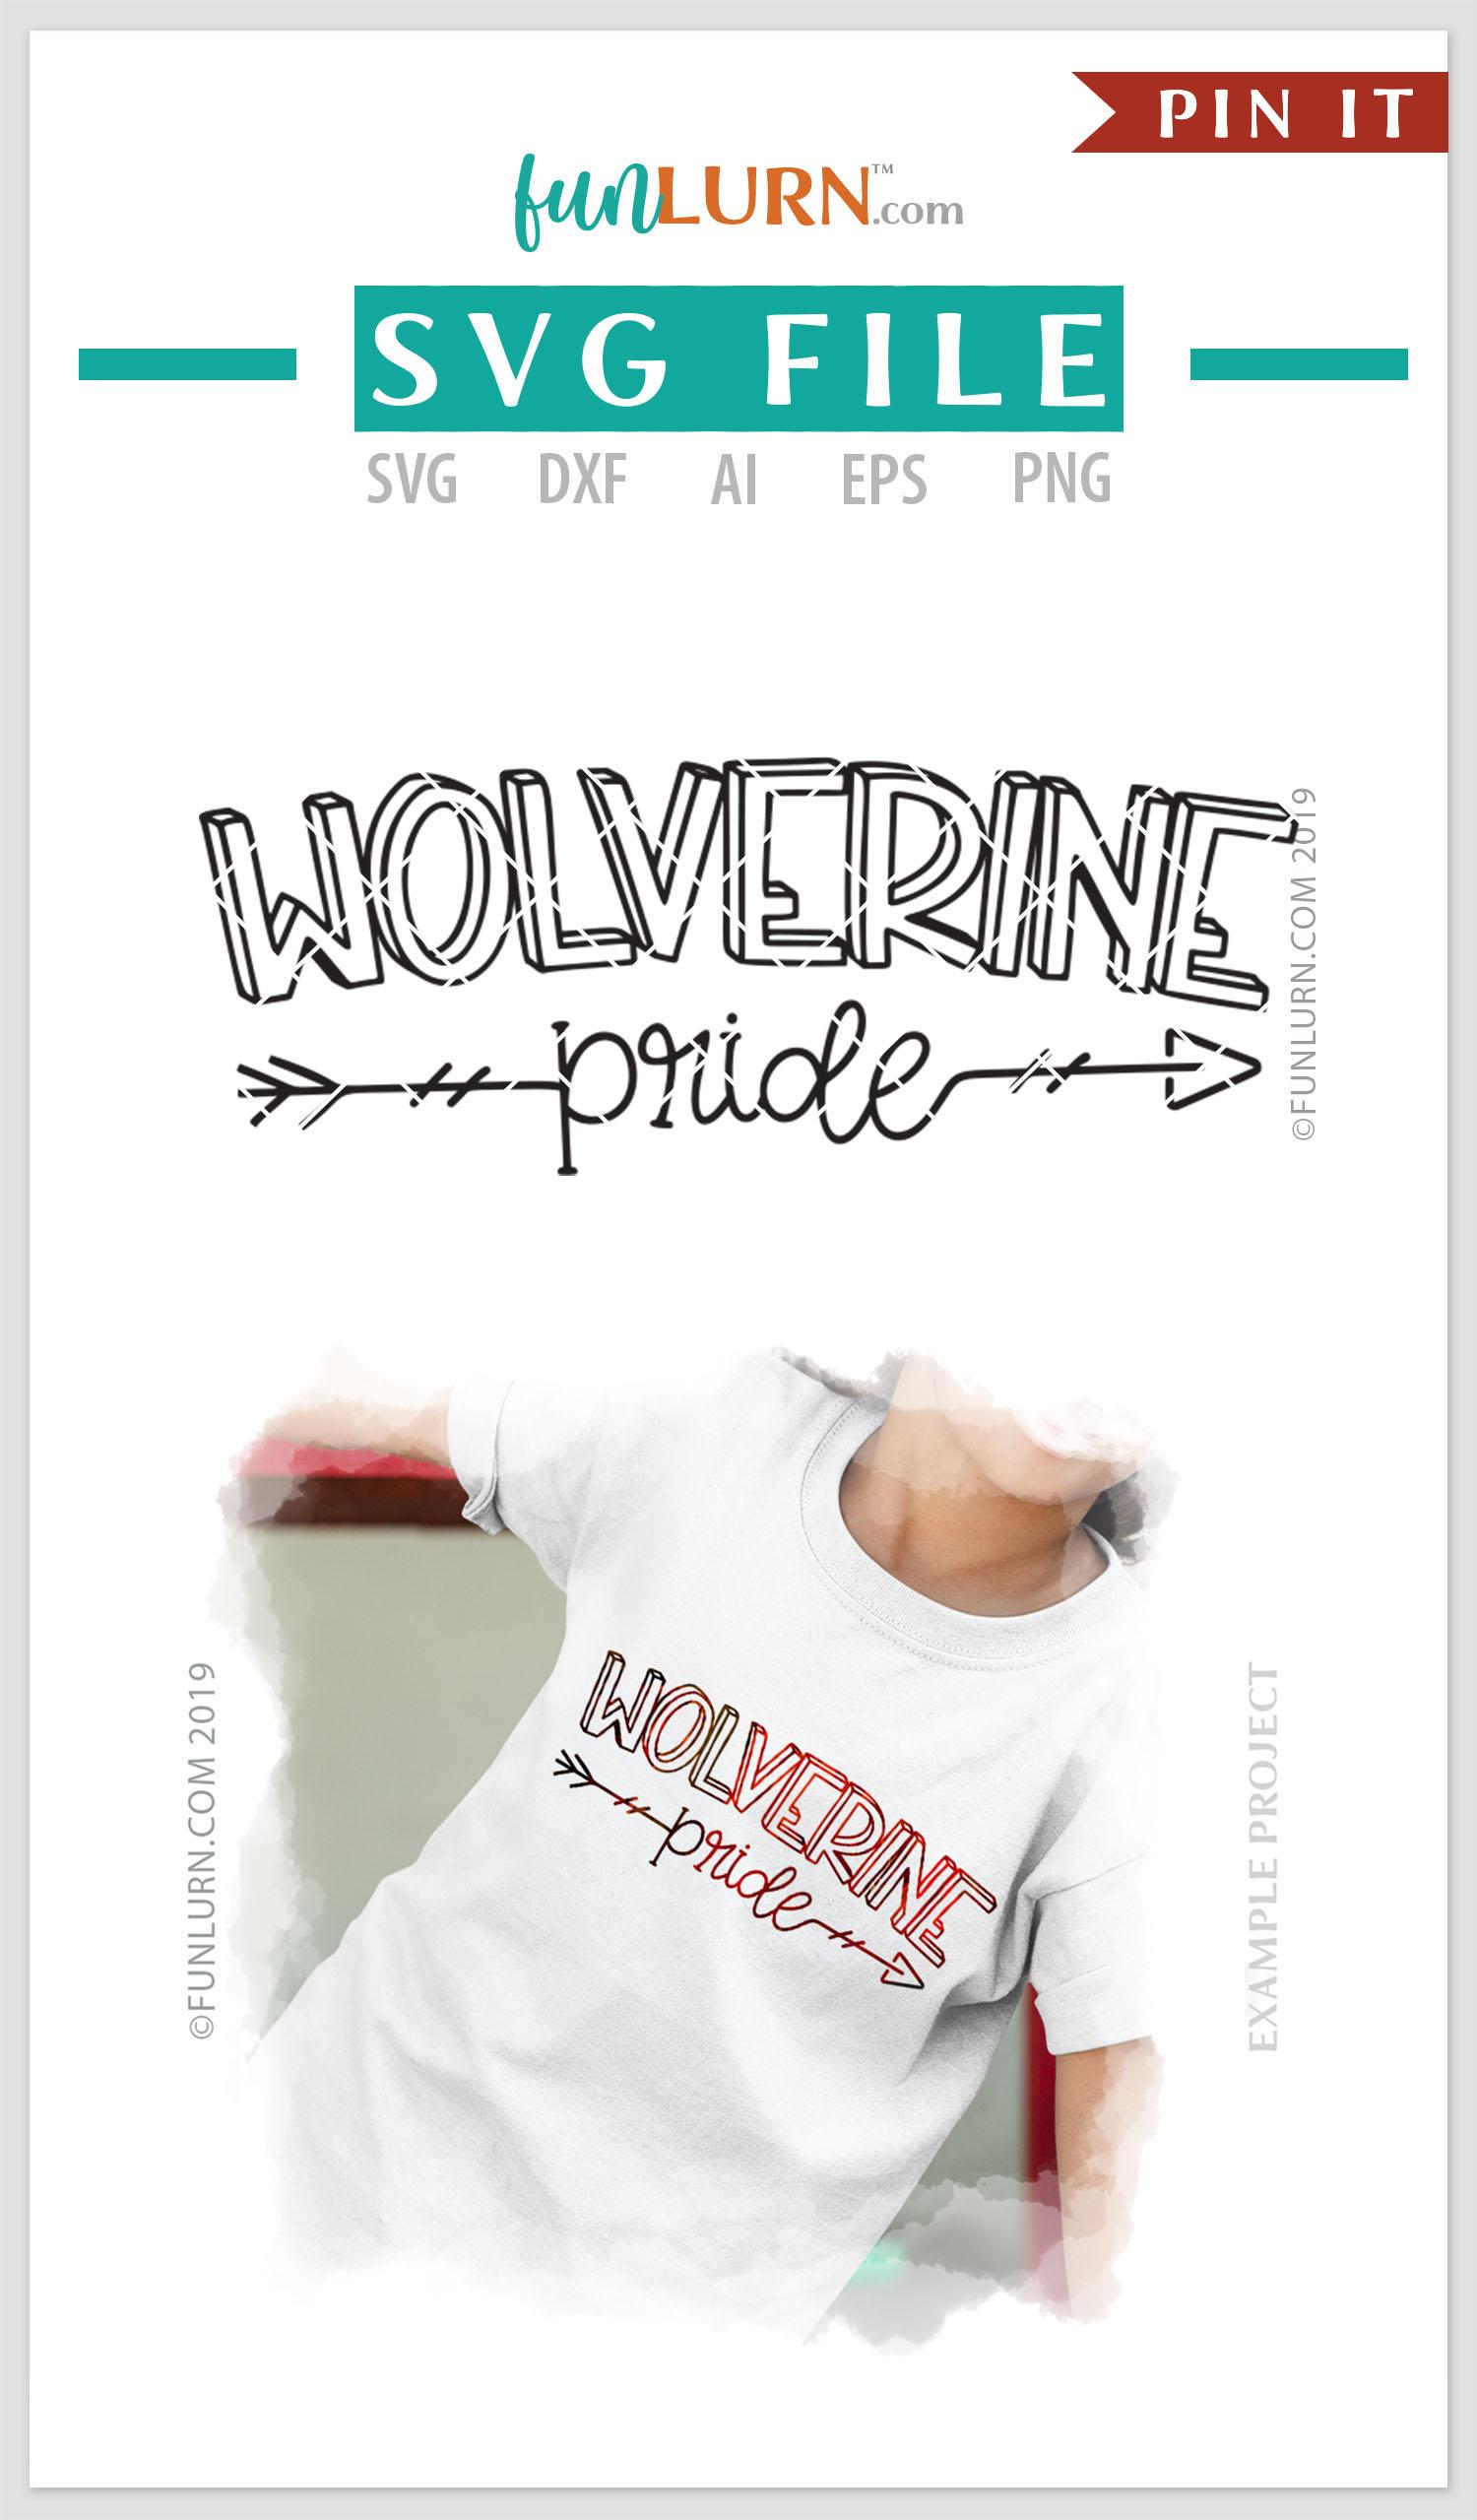 Wolverine Pride Team SVG Cut File example image 4